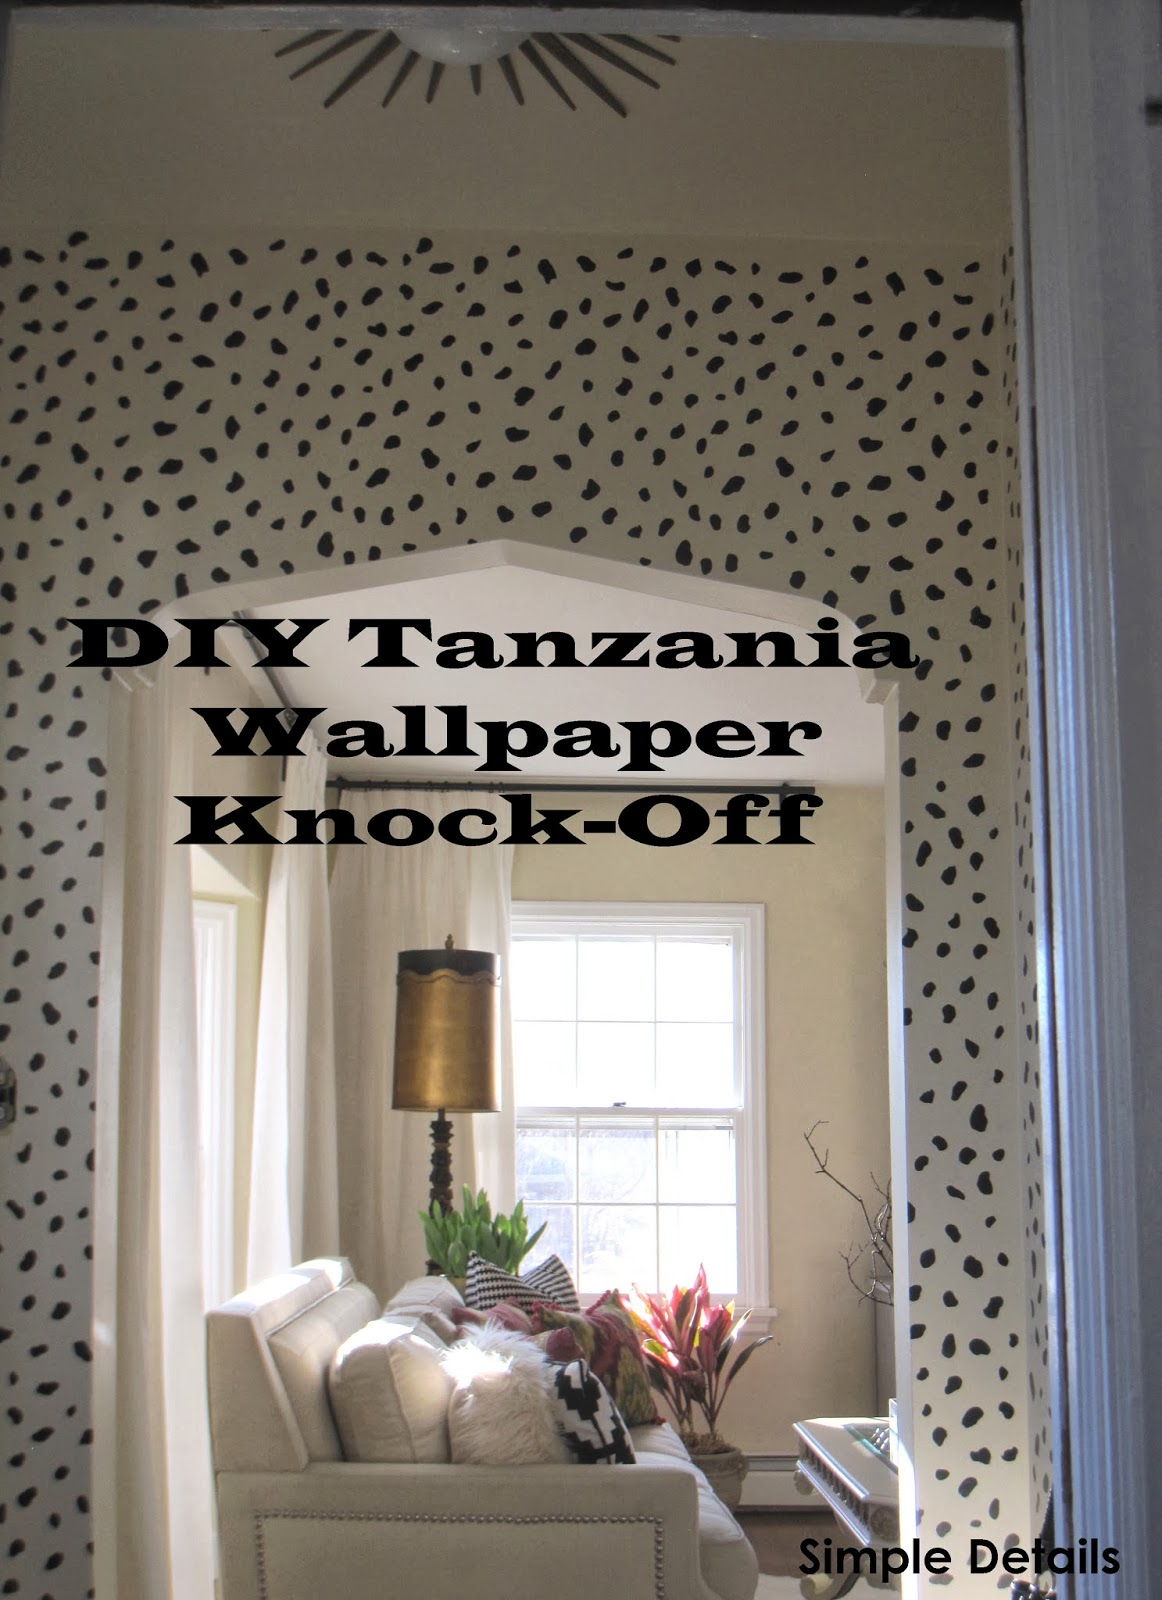 Simple Details Diy Tanzania Wallpaper Knock Off